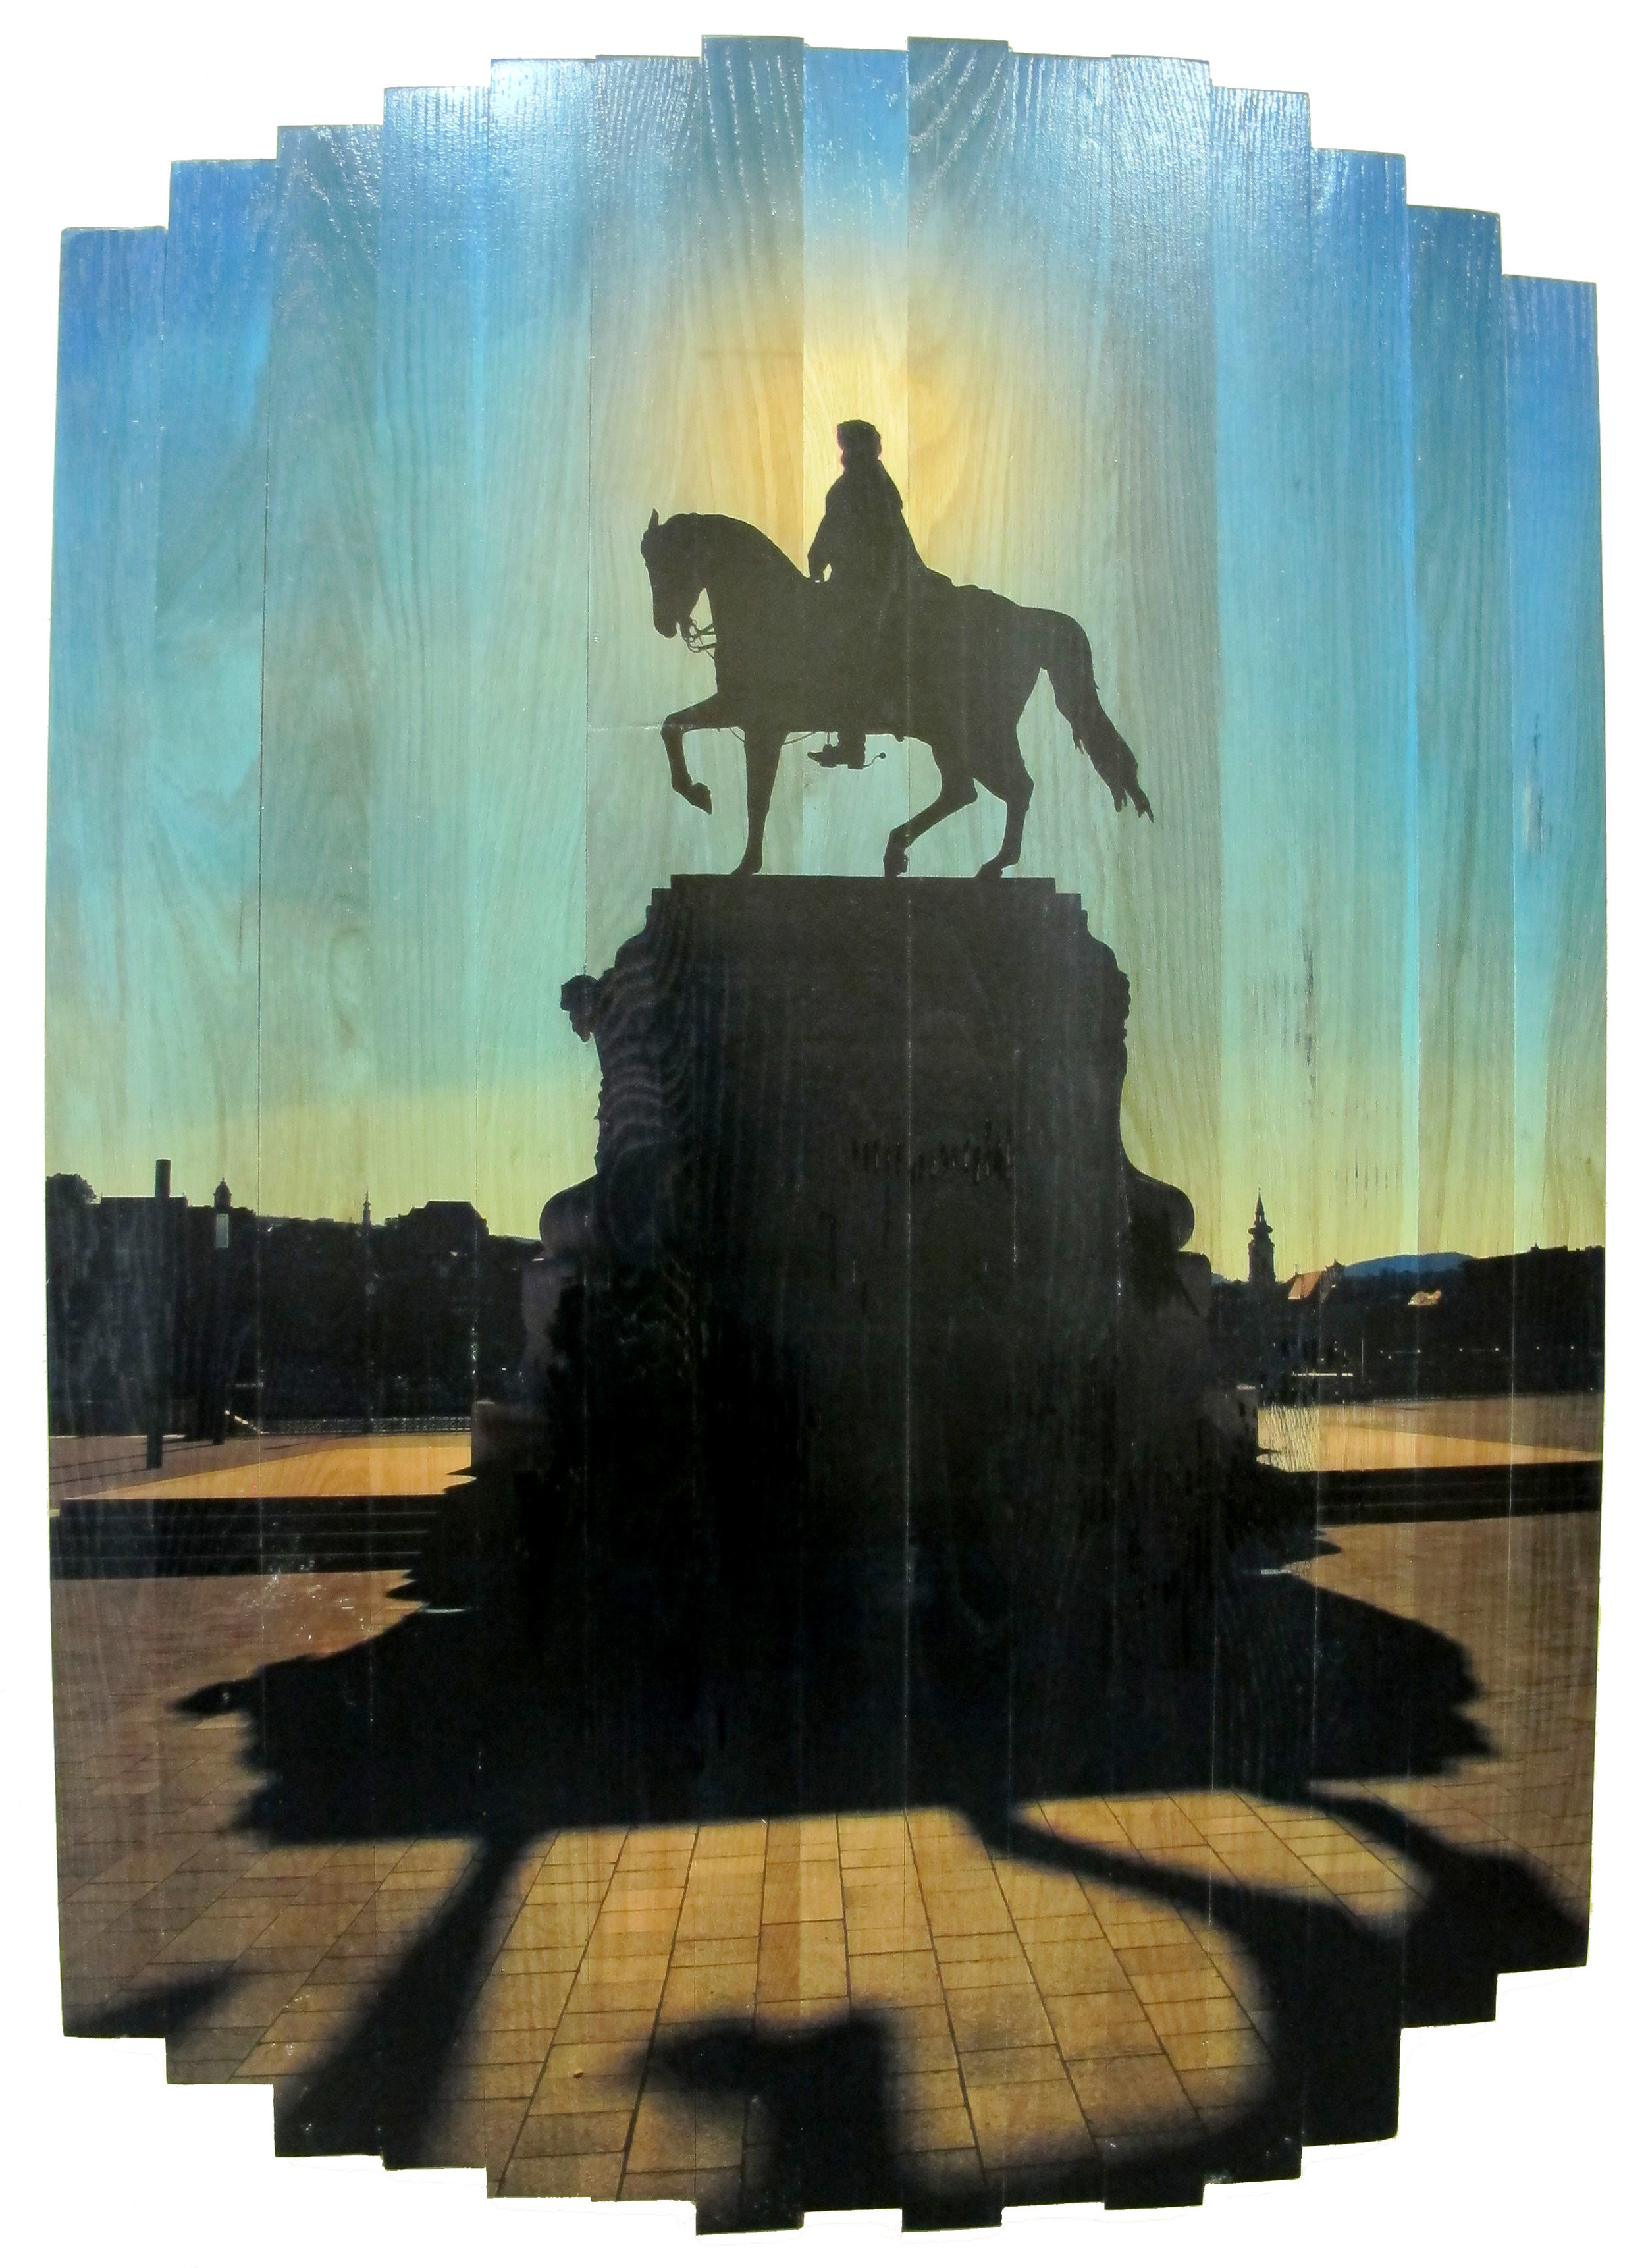 The Emperor - Ferdinand,  2016 c print on reclaimed wood floor 48 x 34 x 1.5 in / 122 x 86 x 4 cm  Unique